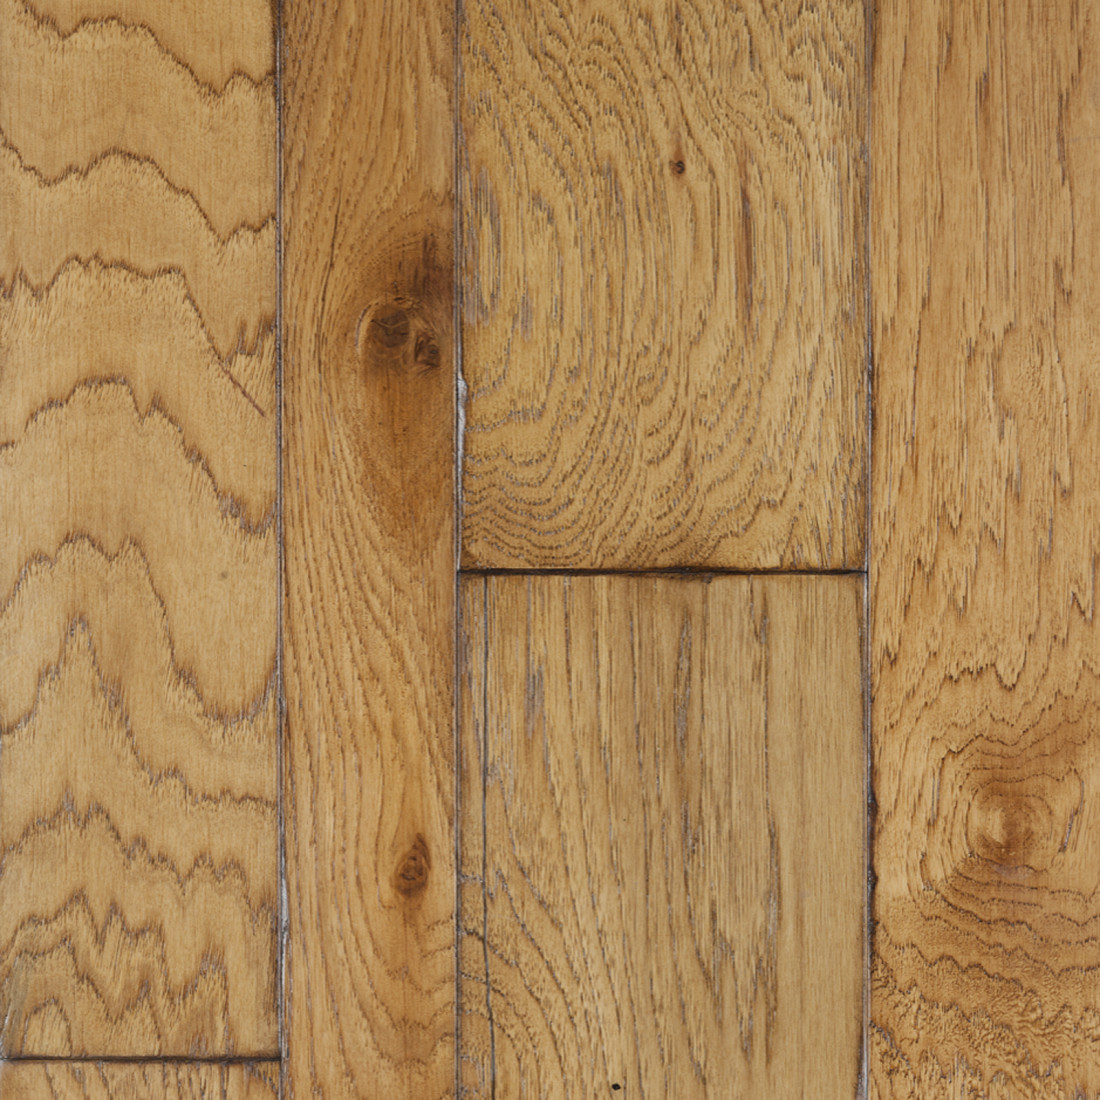 lm engineered hardwood flooring of stone flooring new stone flooring berkshire for stone flooring berkshire pictures